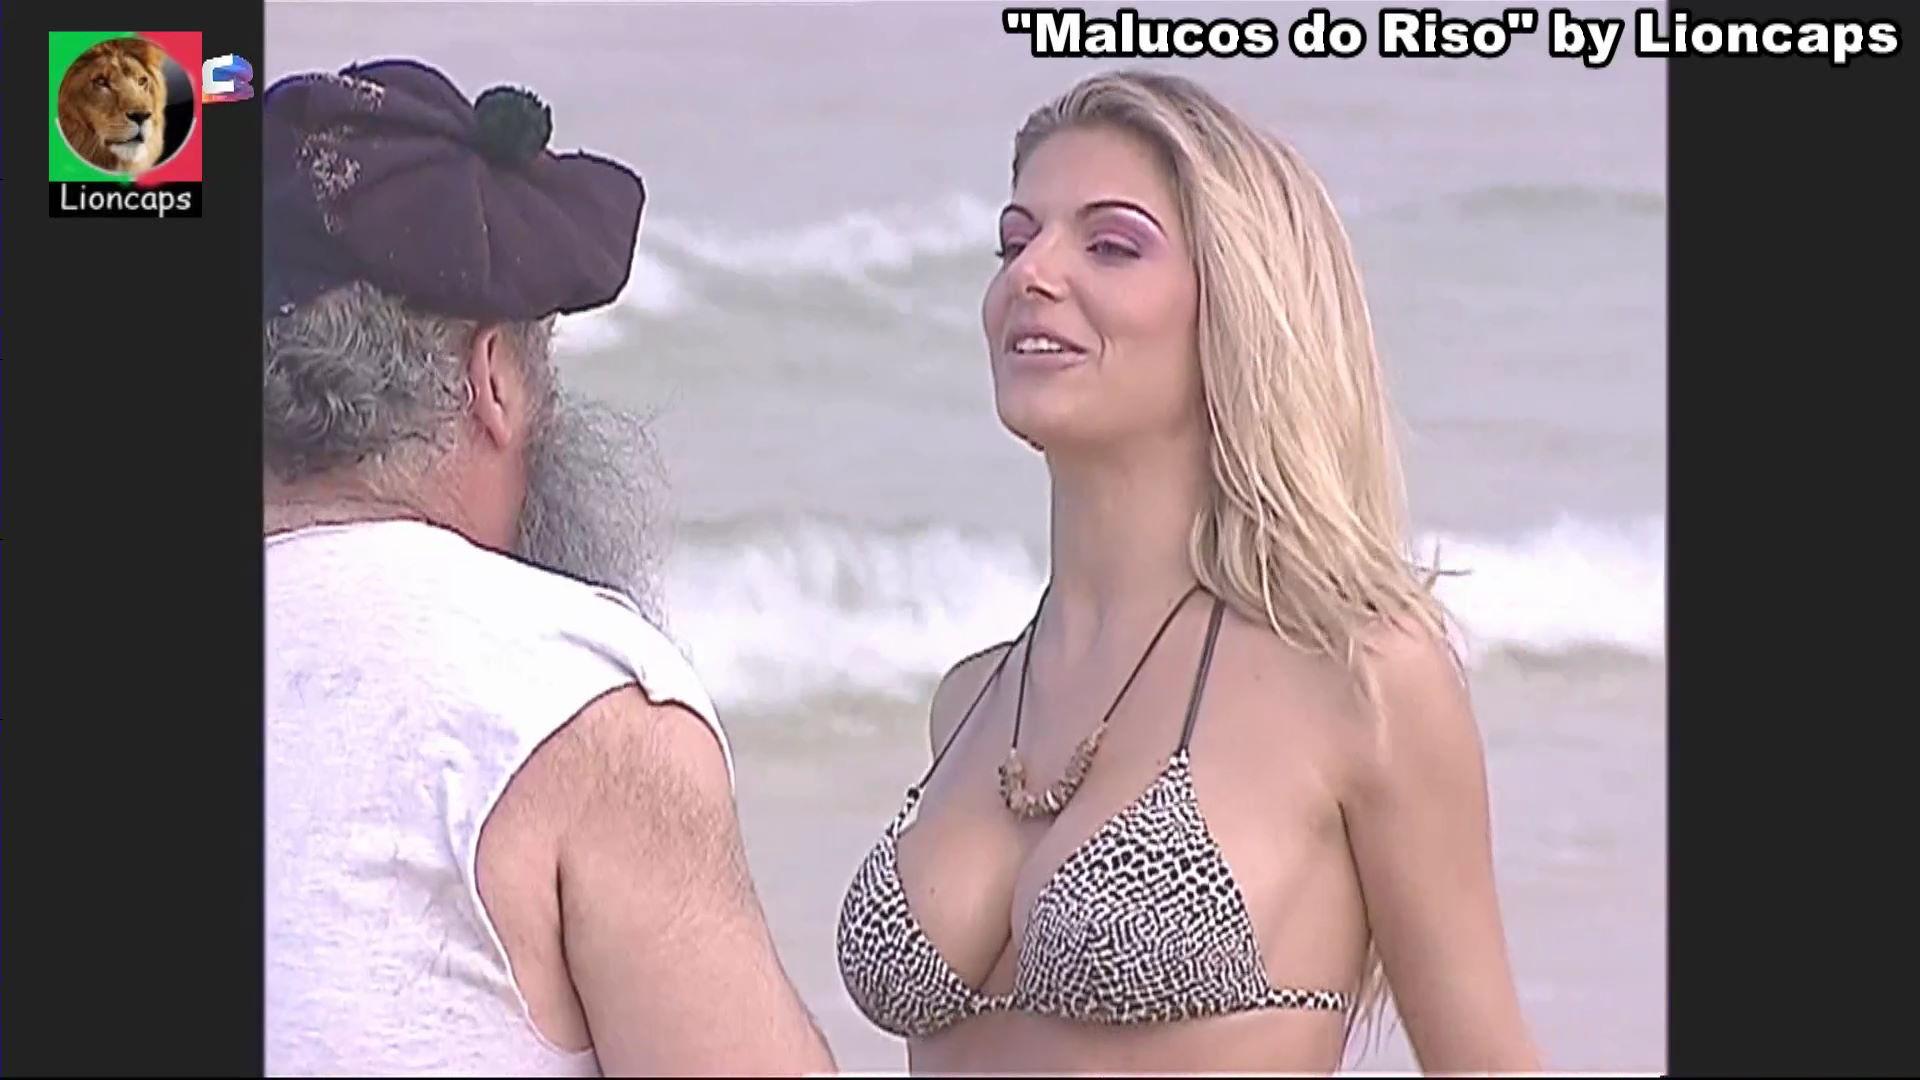 475163533_malucos_riso_alda_gomes_vs190malucos_riso_602_15070_122_581lo.JPG